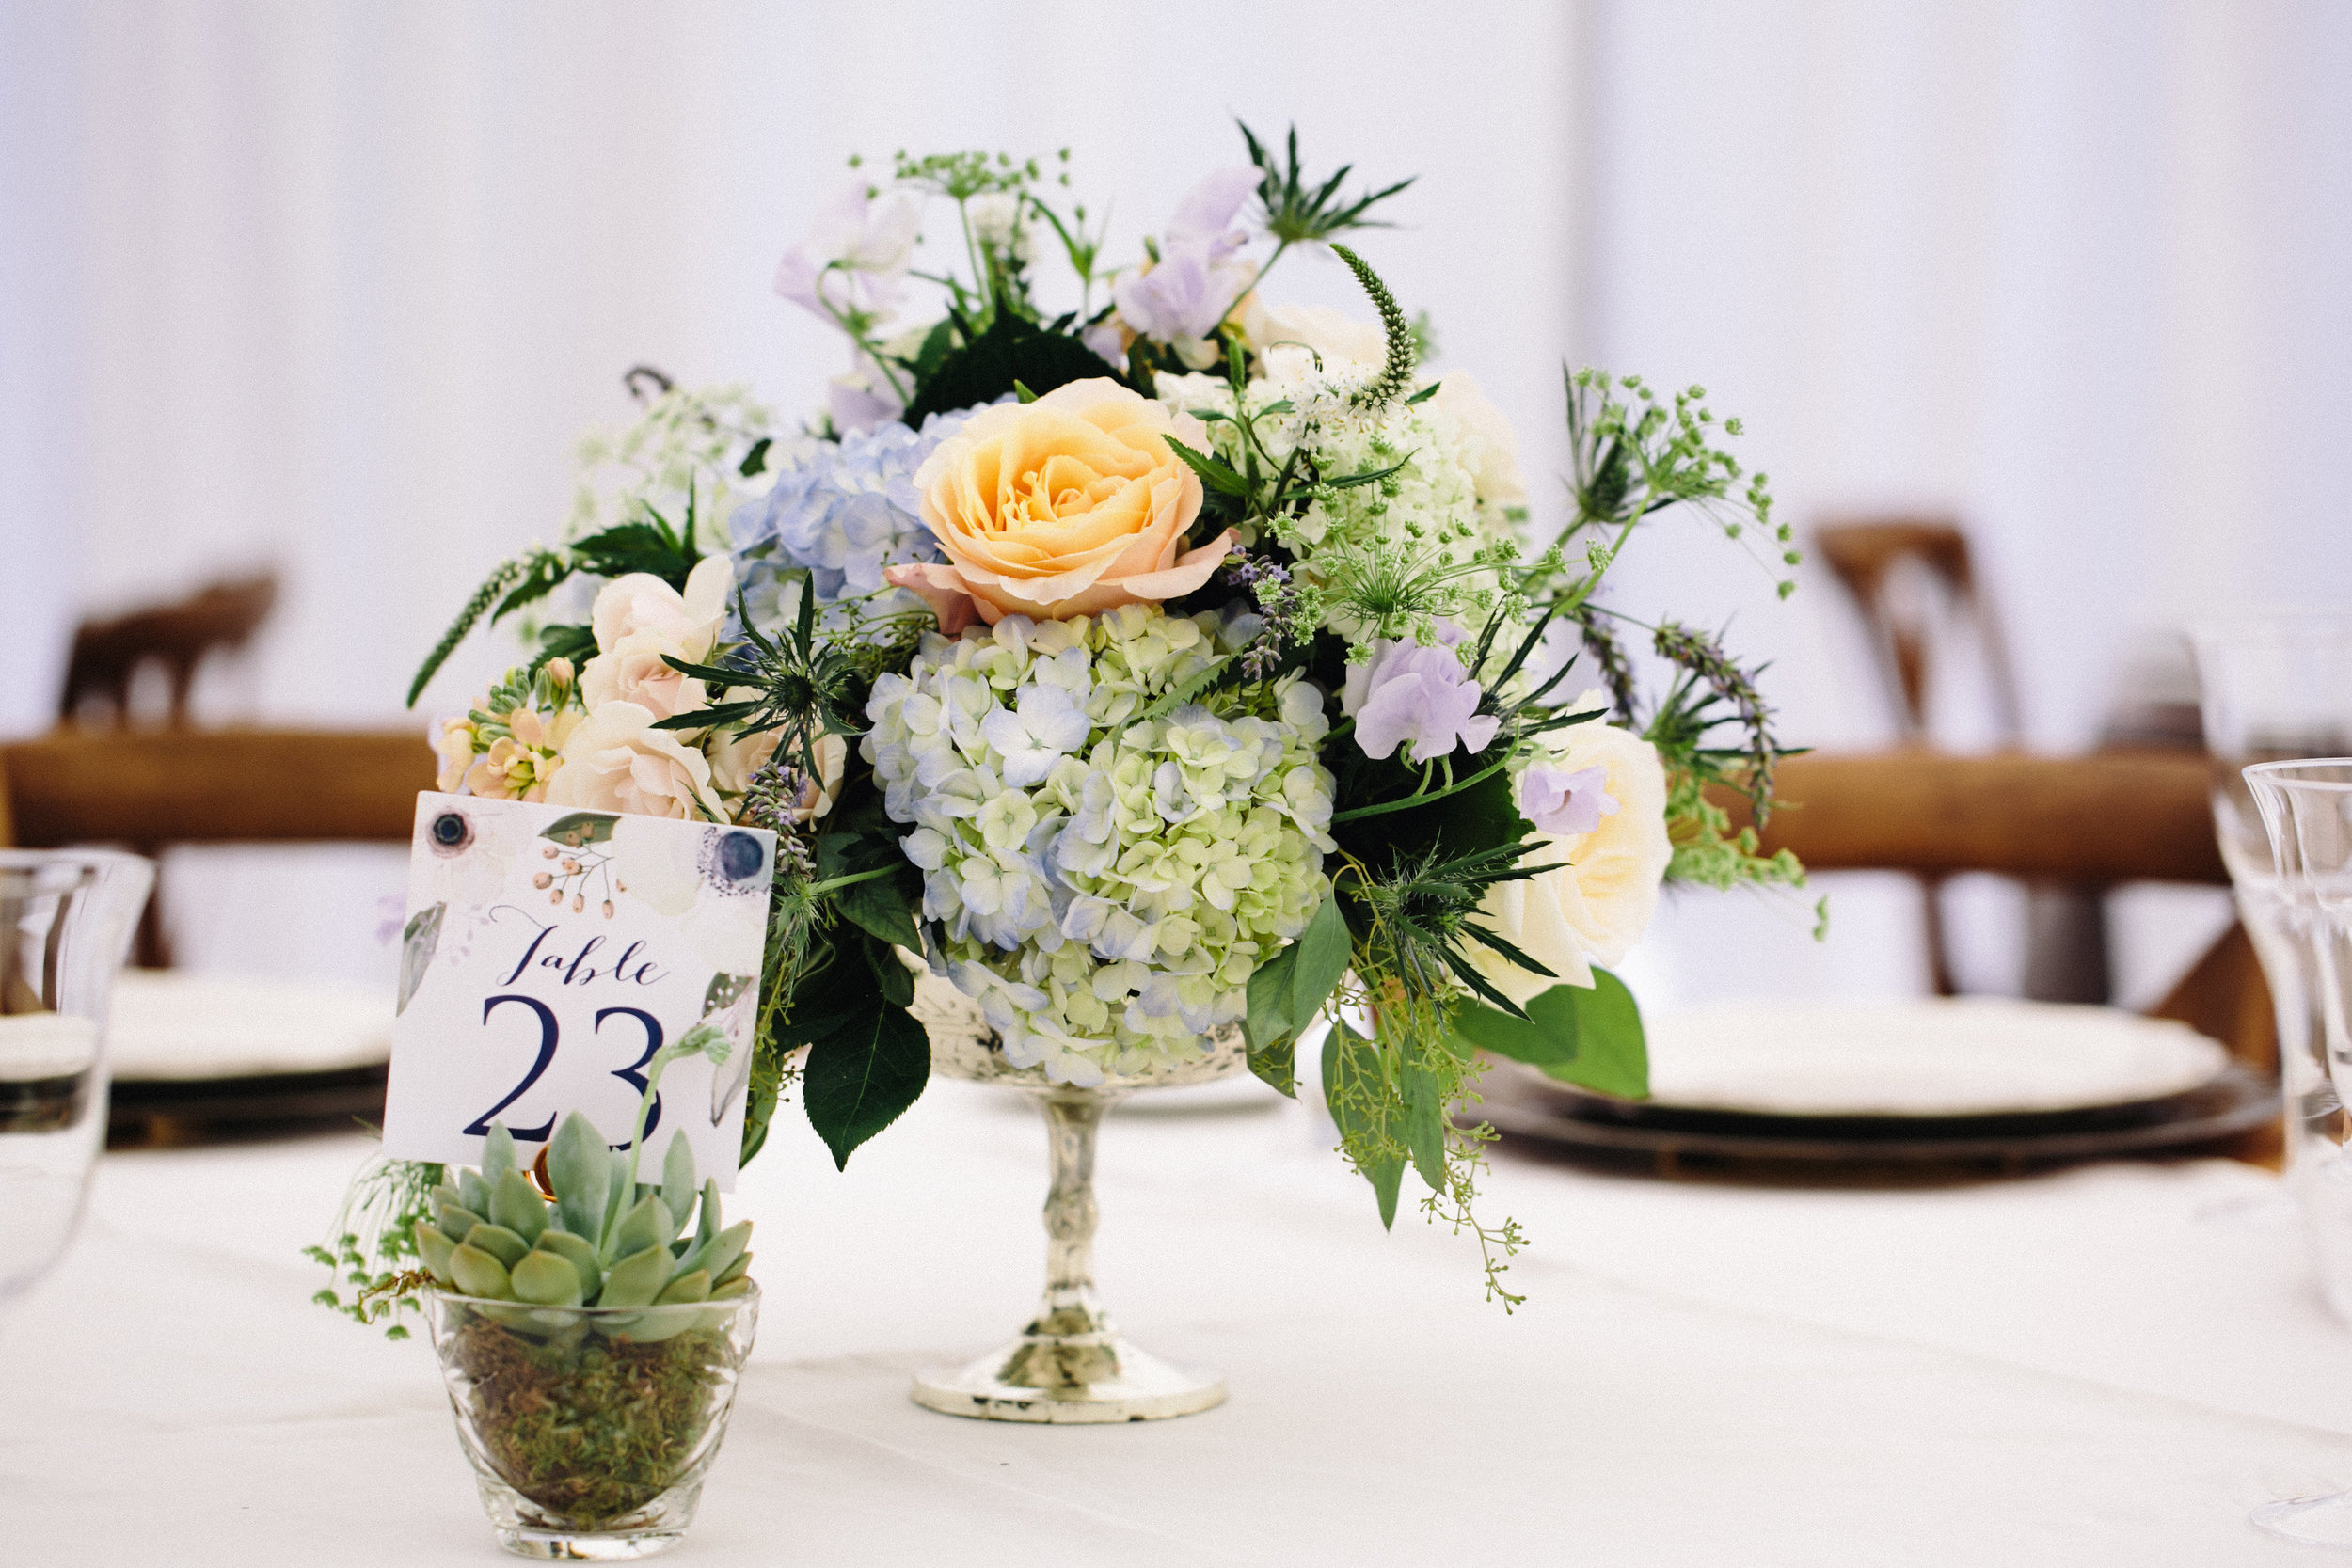 NJ Wedding, Private Wedding, Backyard Wedding, Tent Reception, Centerpiece, Muted Flowers, Karmapants Photography